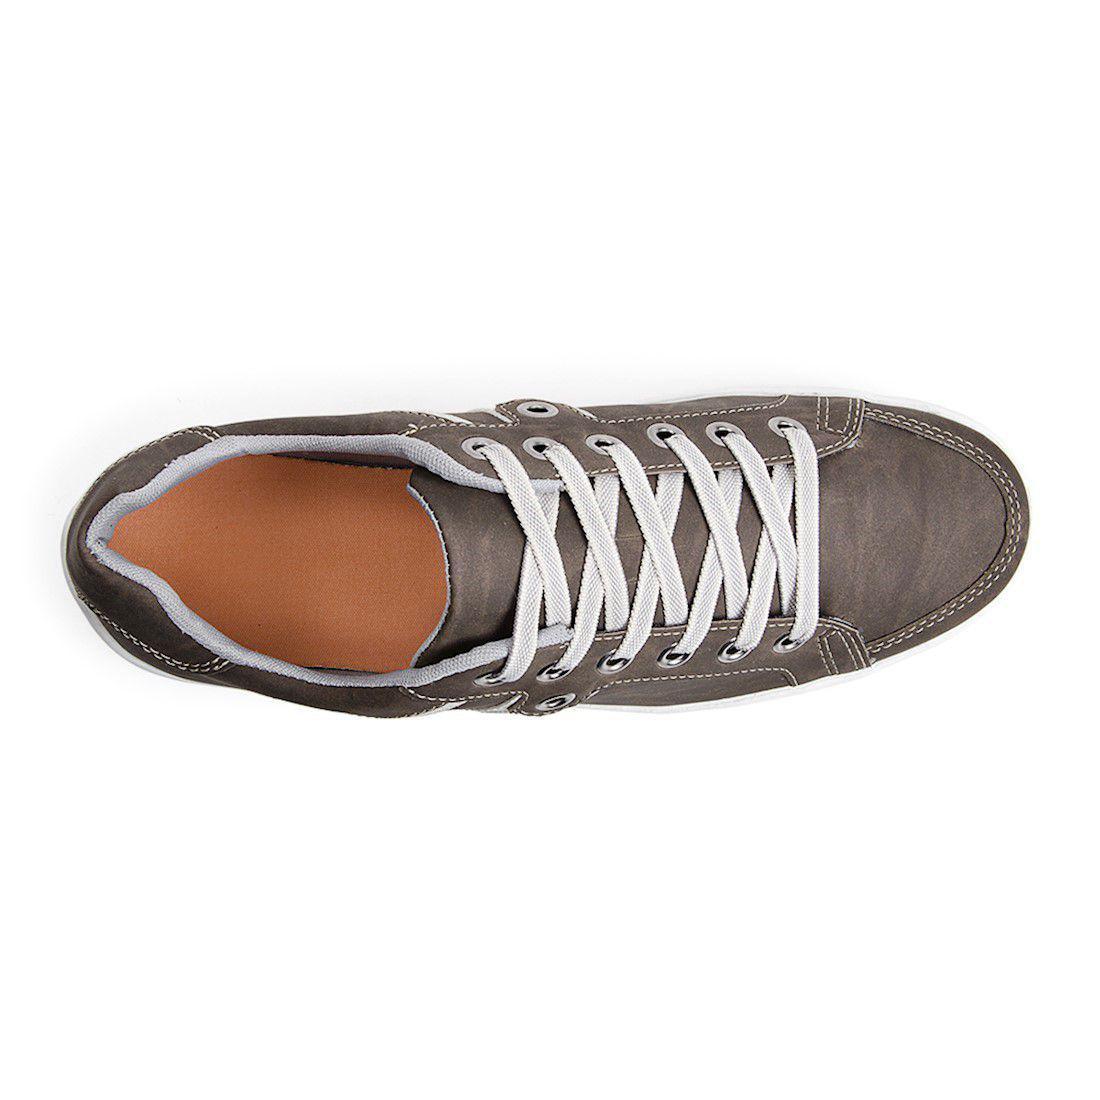 16b8dc846 Kit sapatênis masculino sandro moscoloni craves marrom escuro + craves  branco brown R$ 149,90 à vista. Adicionar à sacola